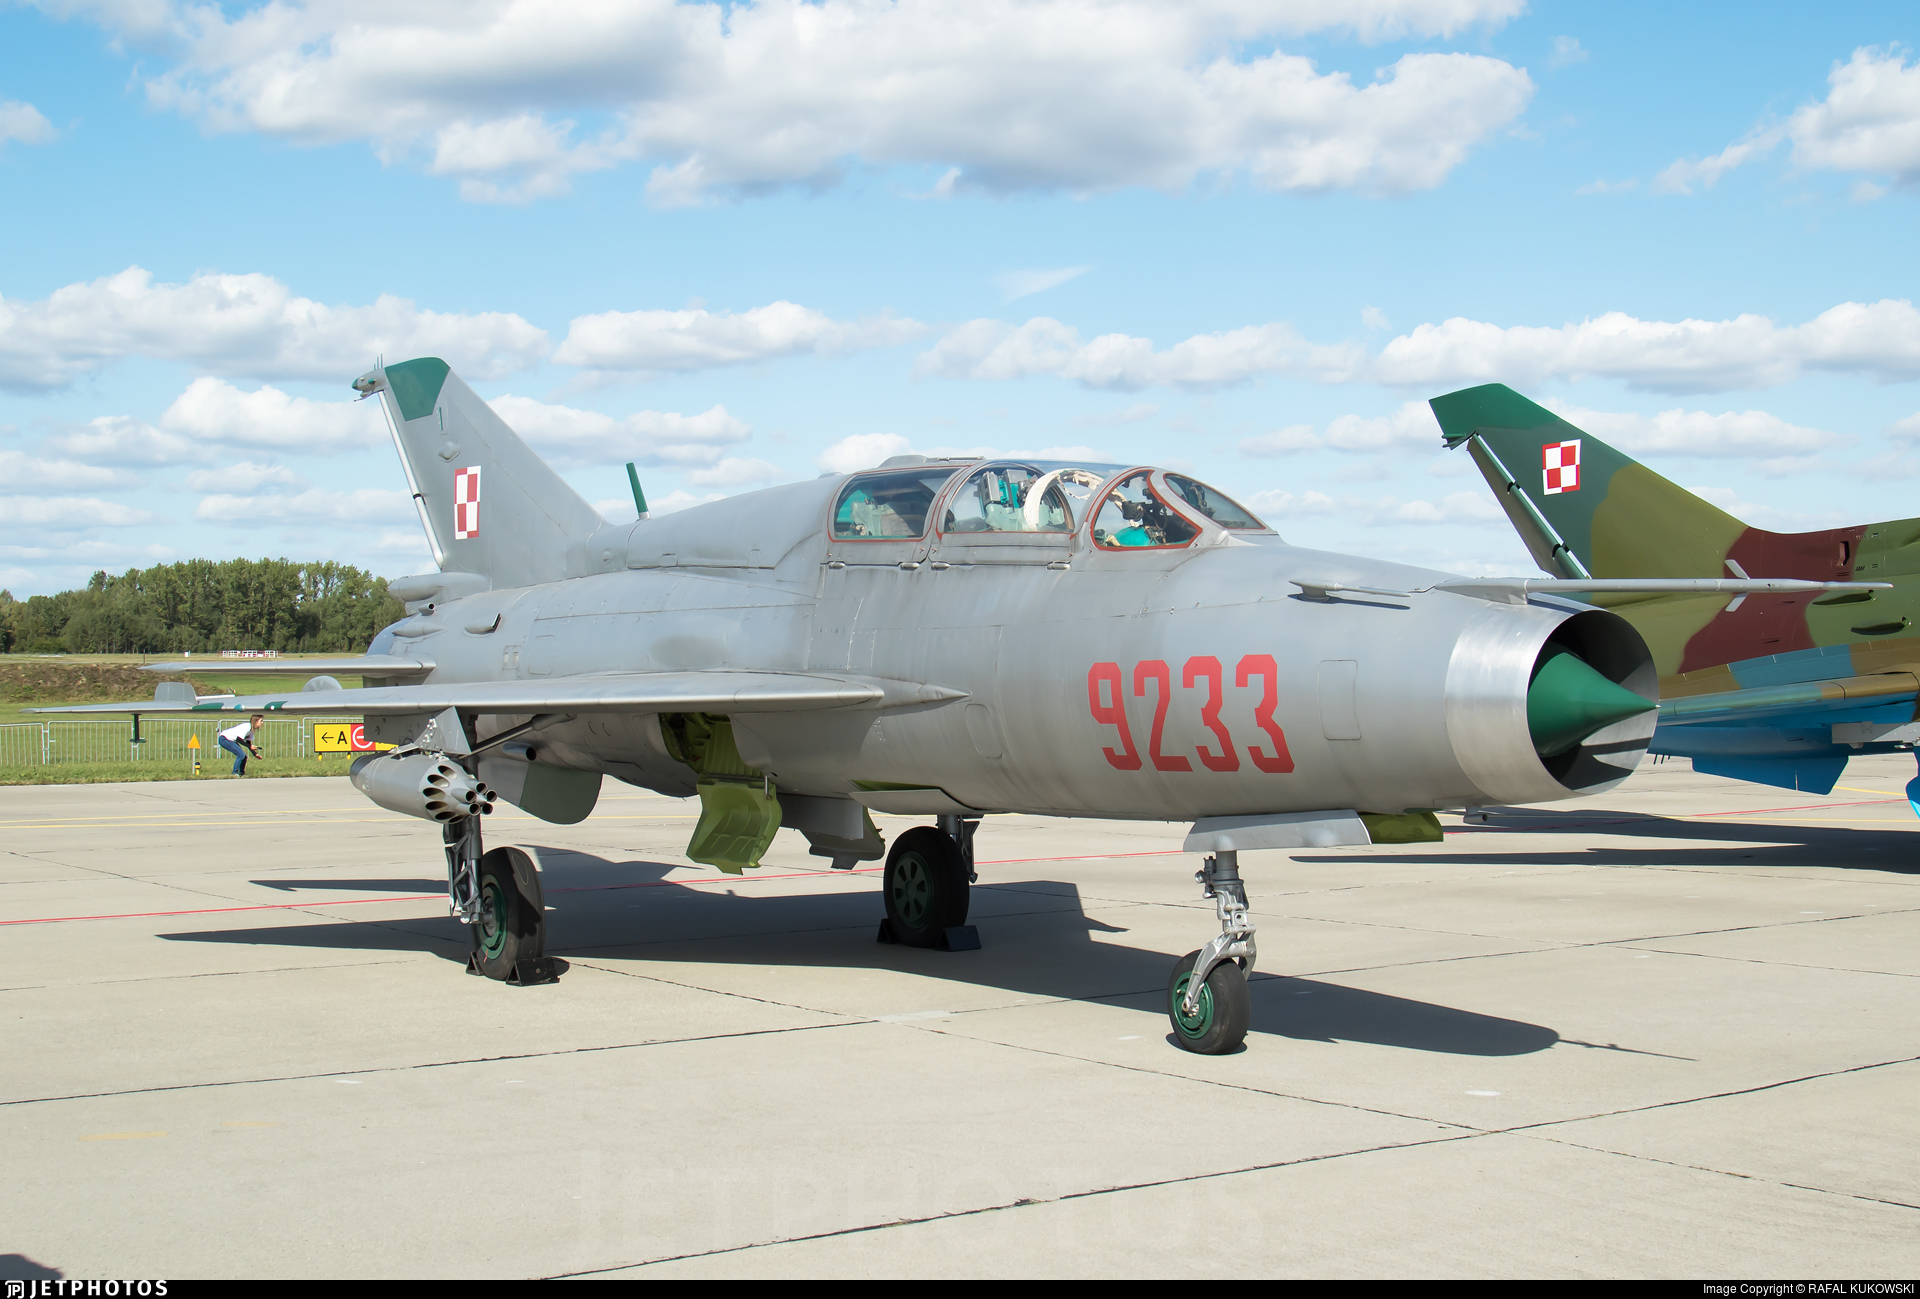 9233 - Mikoyan-Gurevich MiG-21UM Mongol B - Poland - Air Force